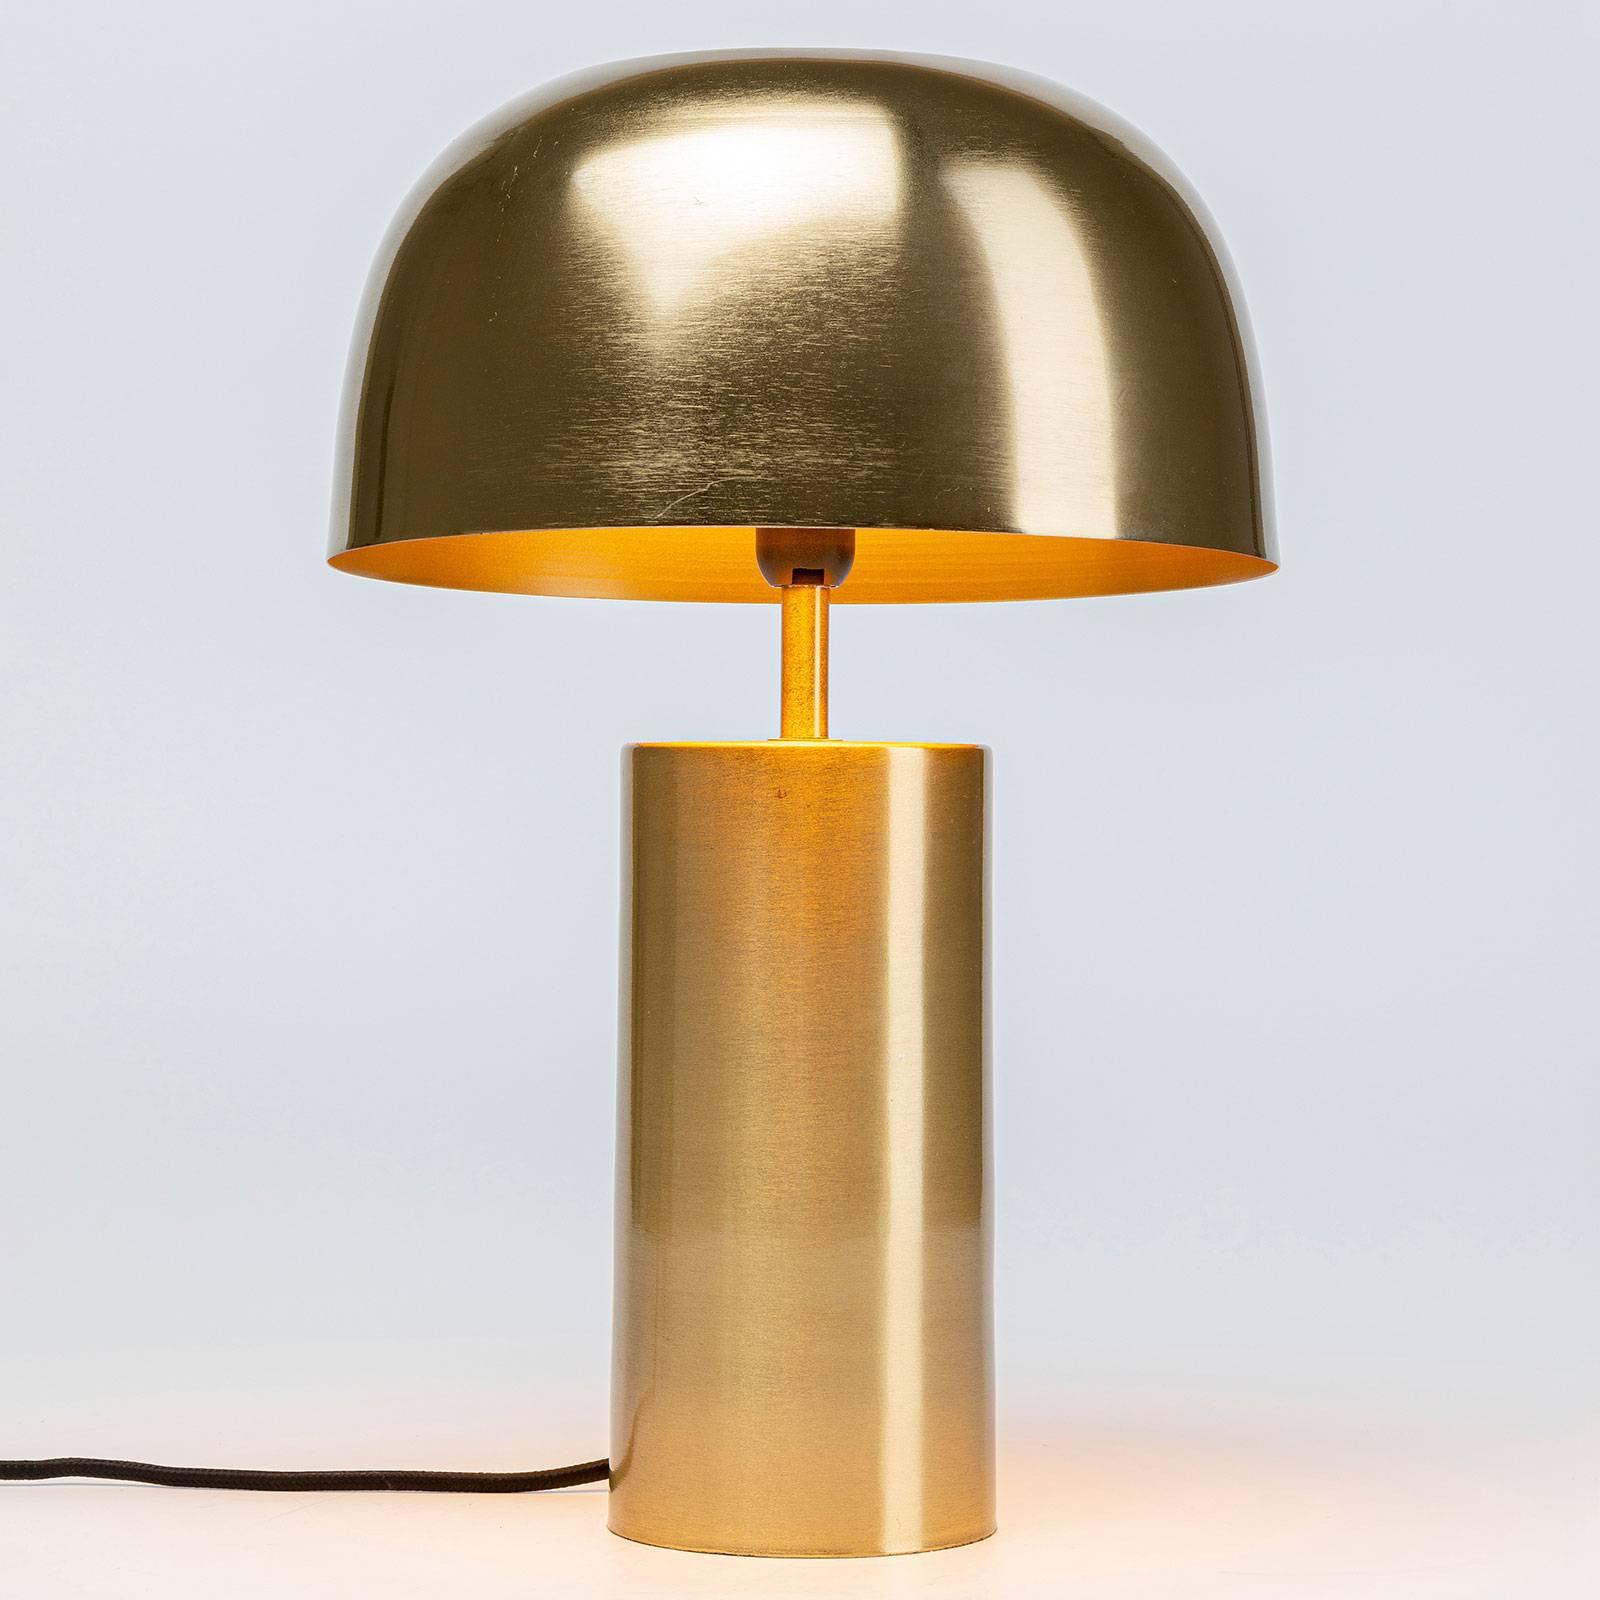 KARE Loungy Gold bordlampe, gull